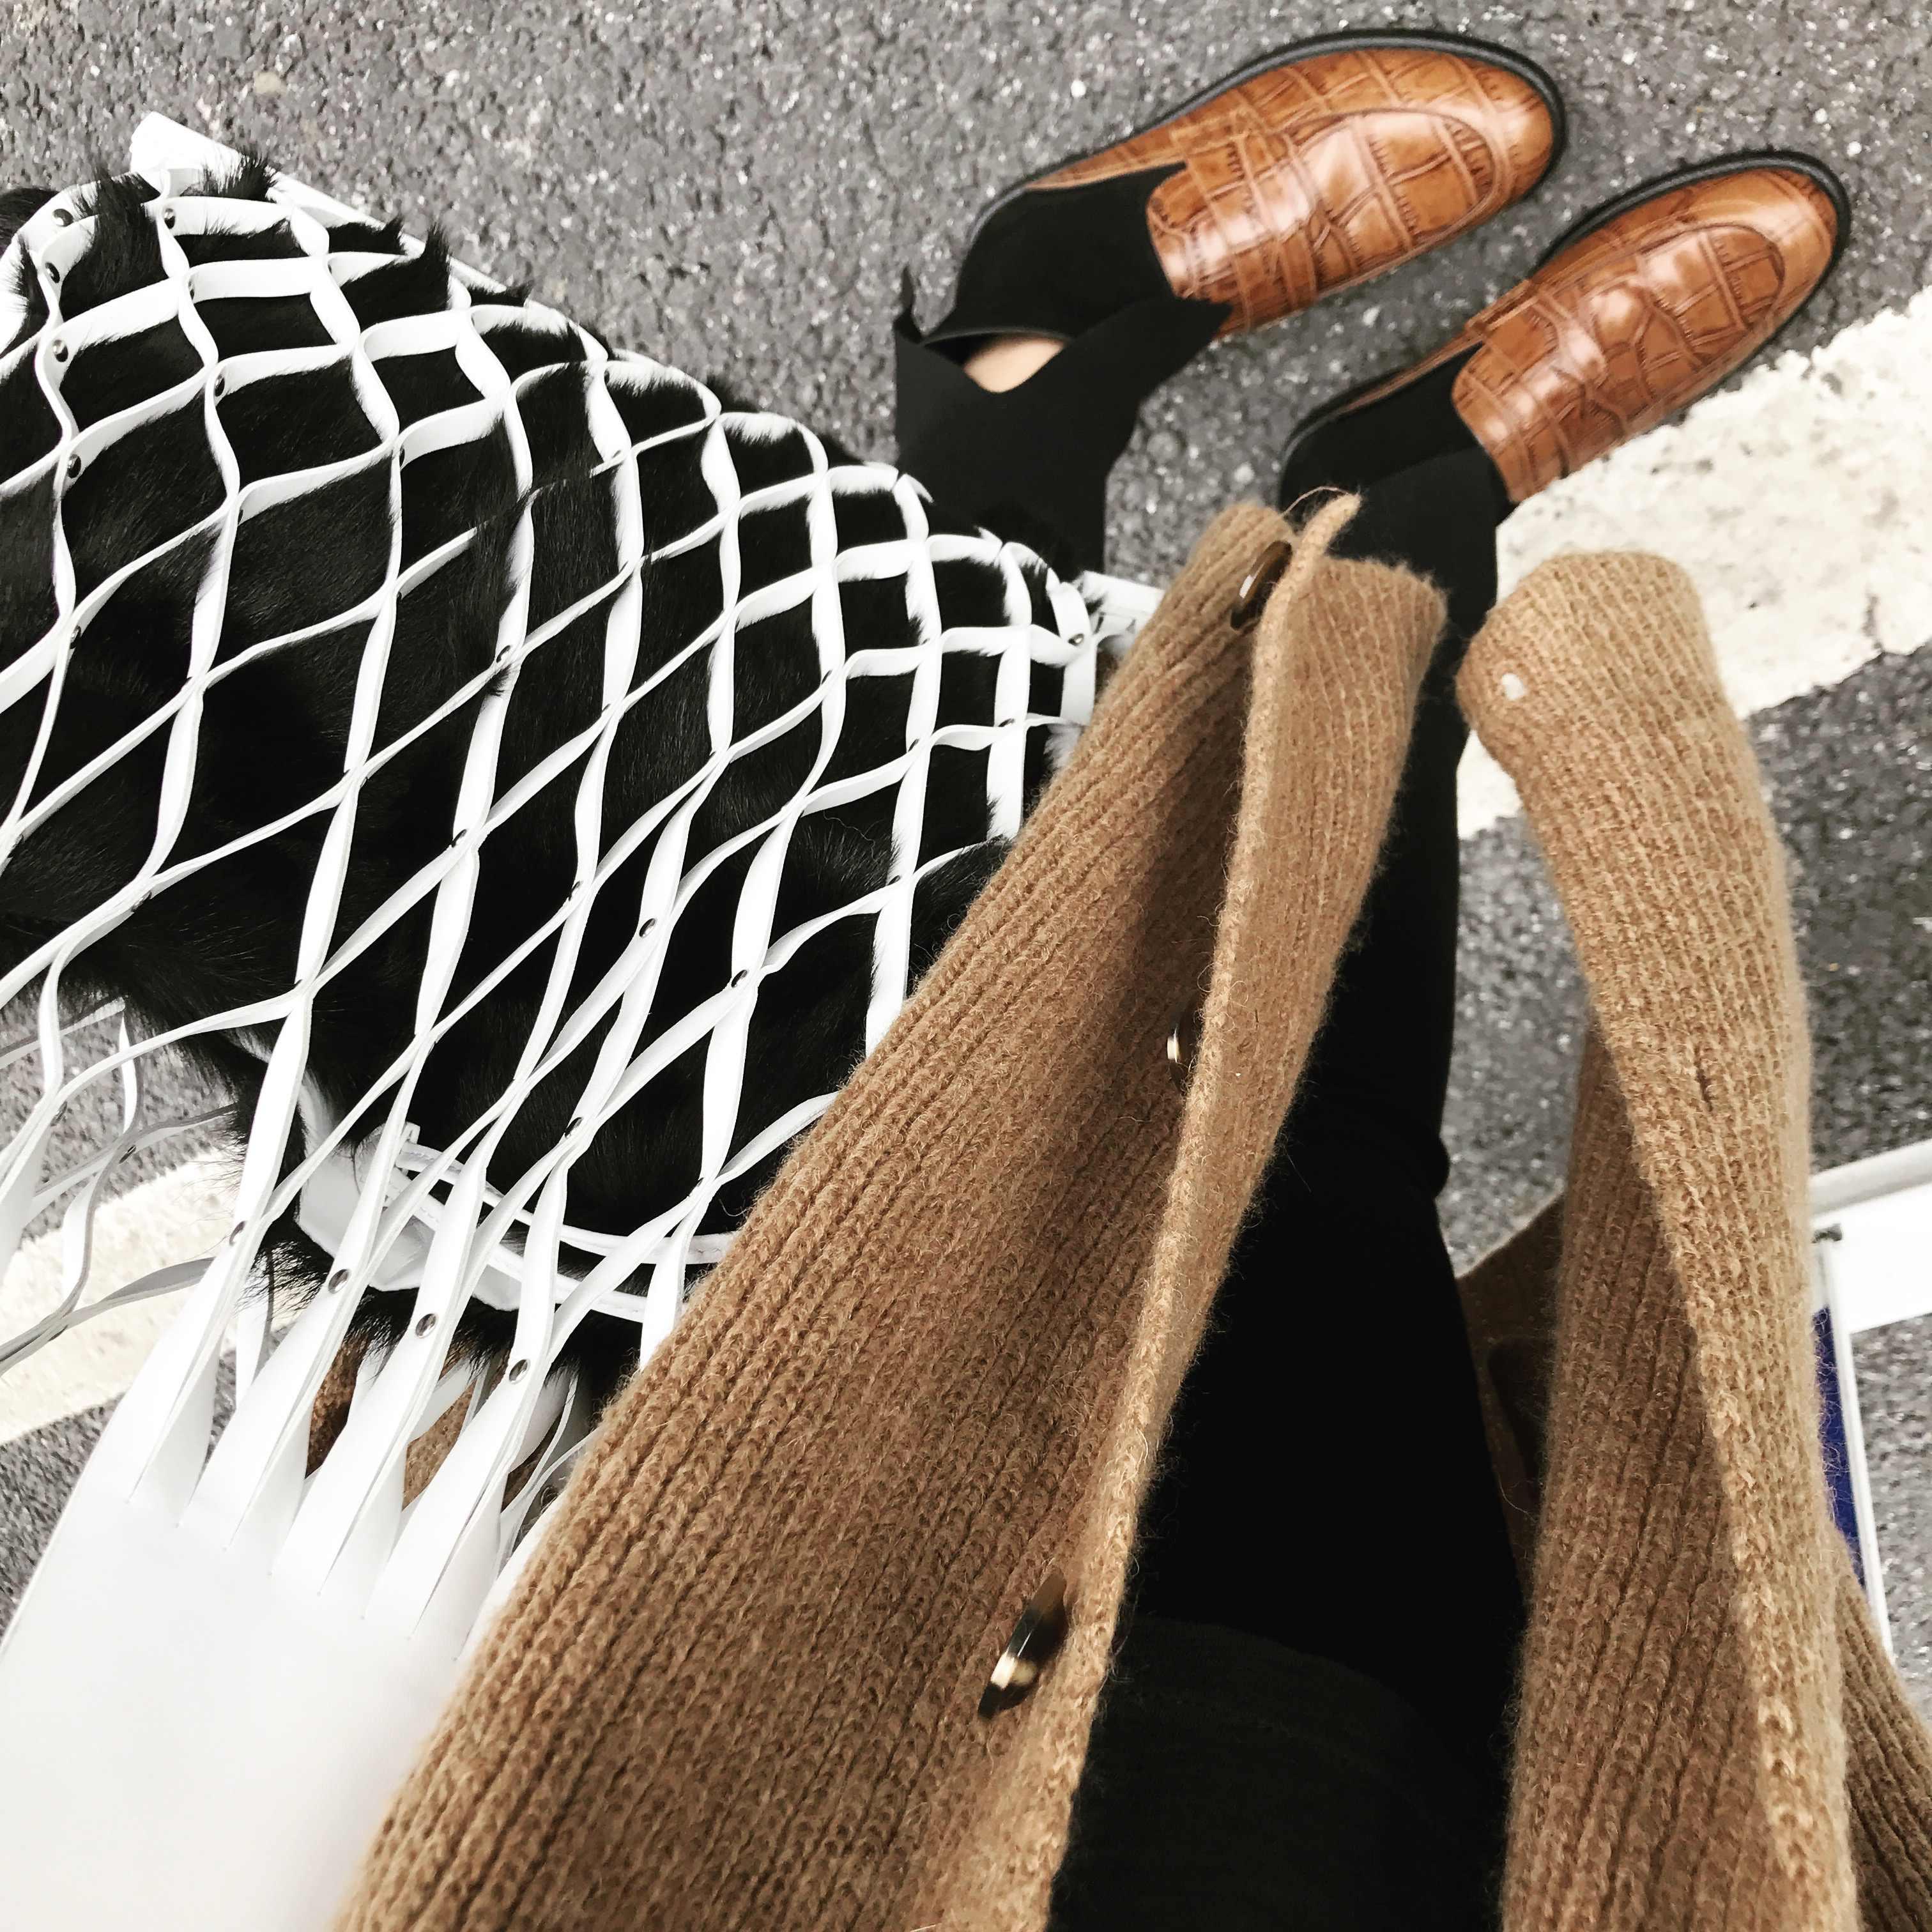 Novo oco para fora malha sacos de couro praia ombro saco do mensageiro bolsas balde saco lazer grande capacidade de pele feminina saco composto